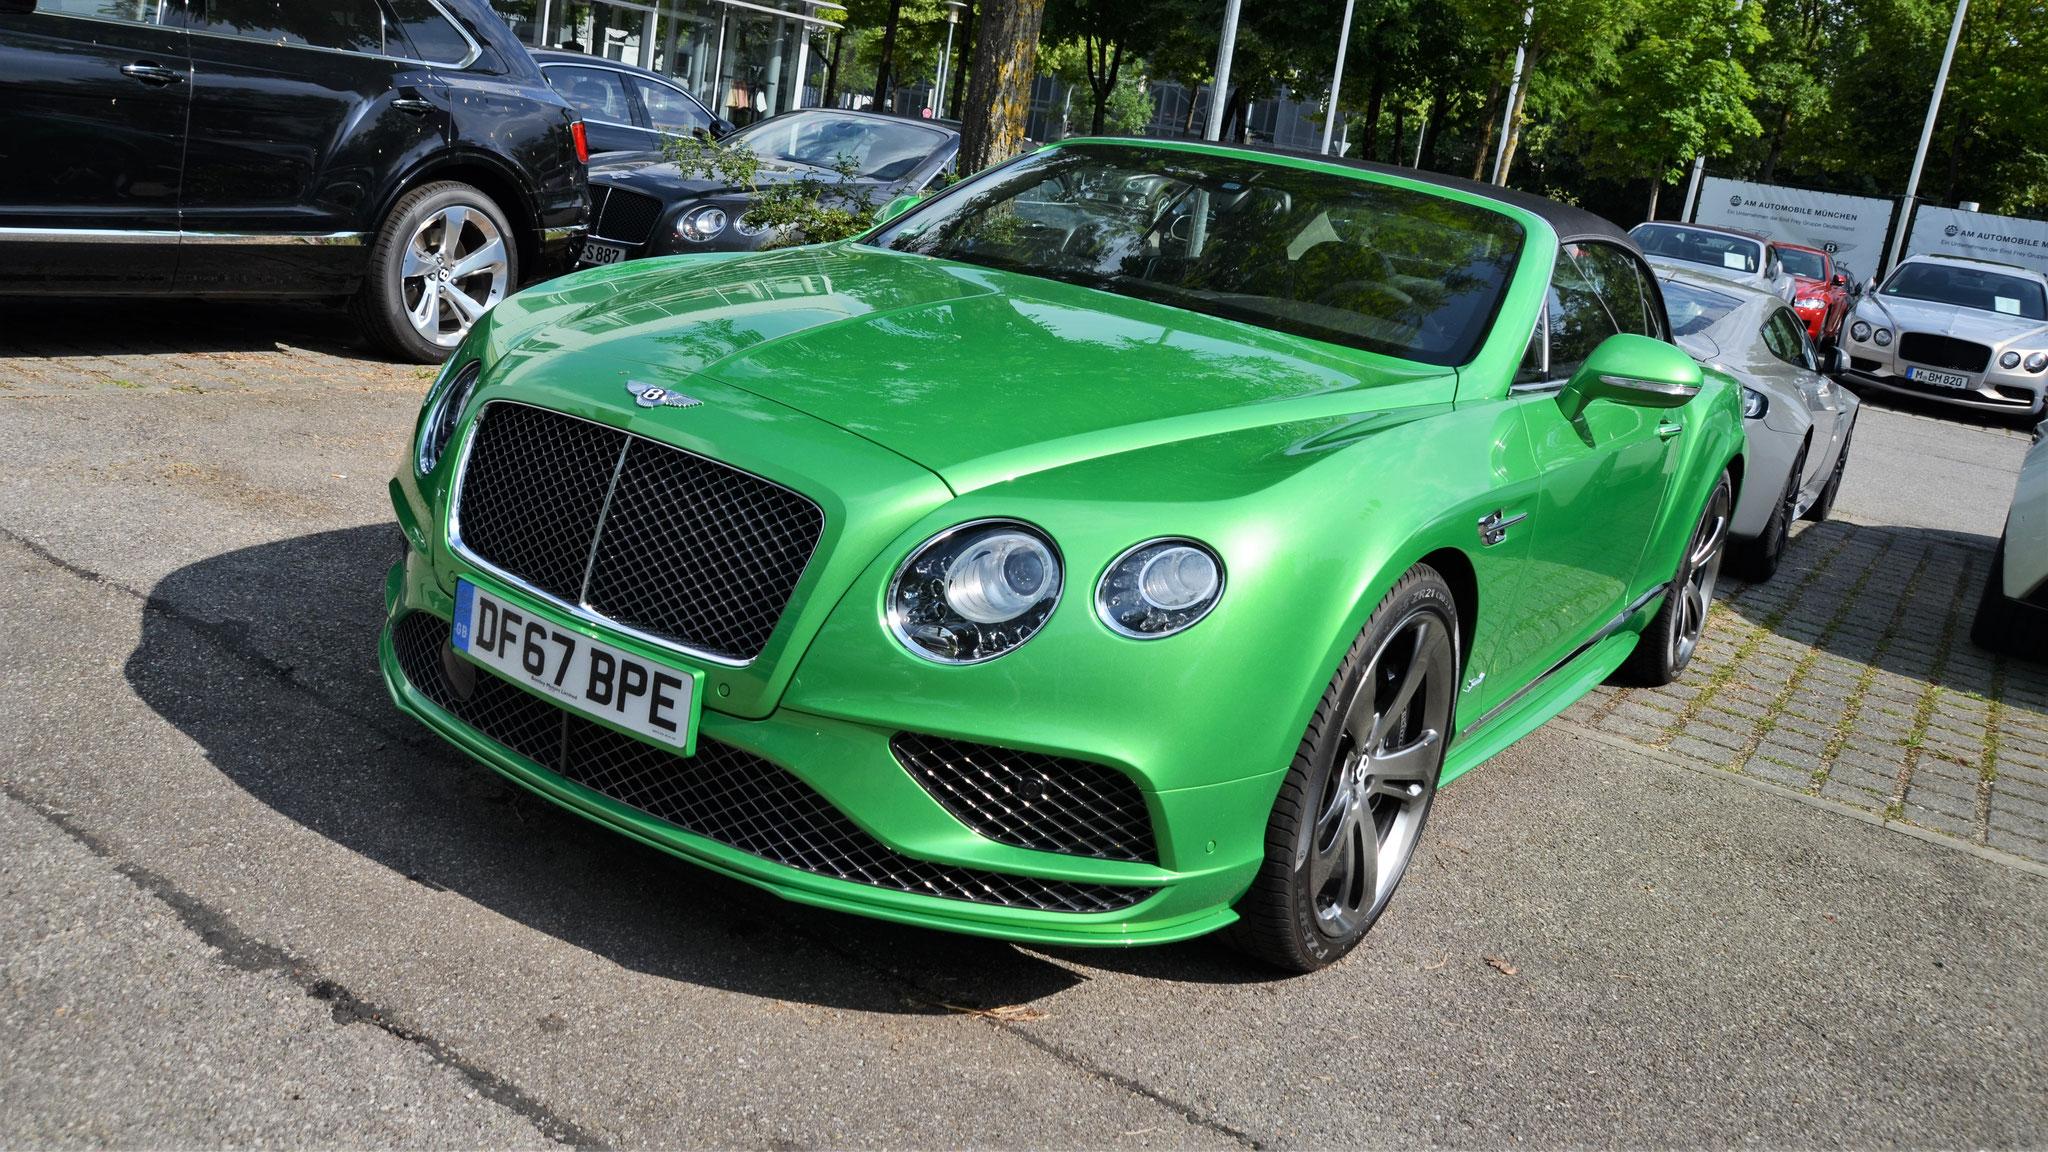 Bentley Continental GTC Speed - DF67-BPE (GB)